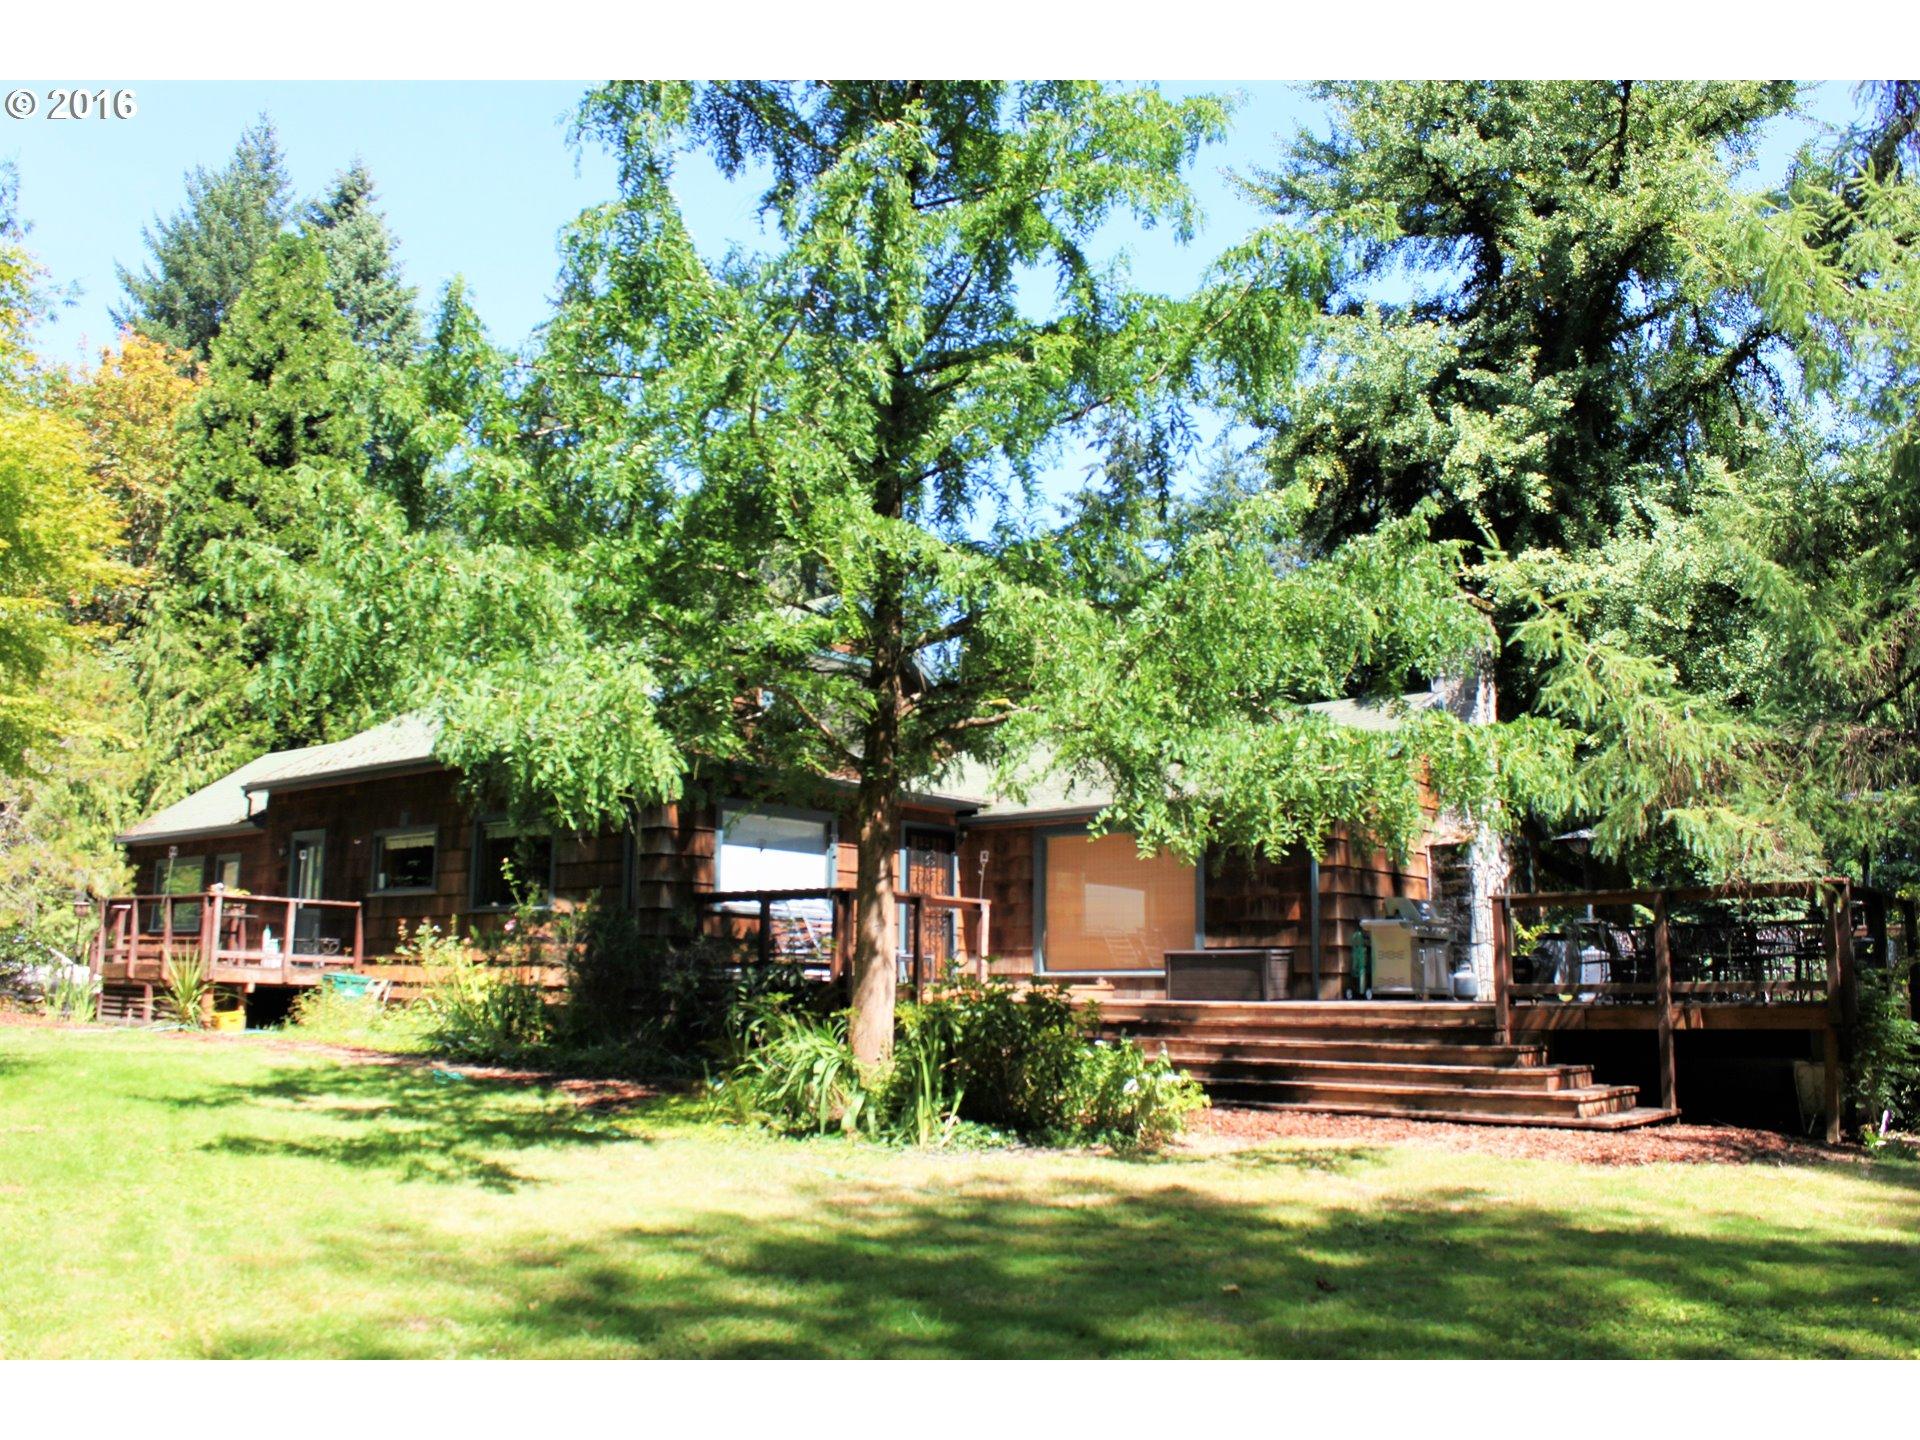 1449 SW CORONADO ST, Portland OR 97219